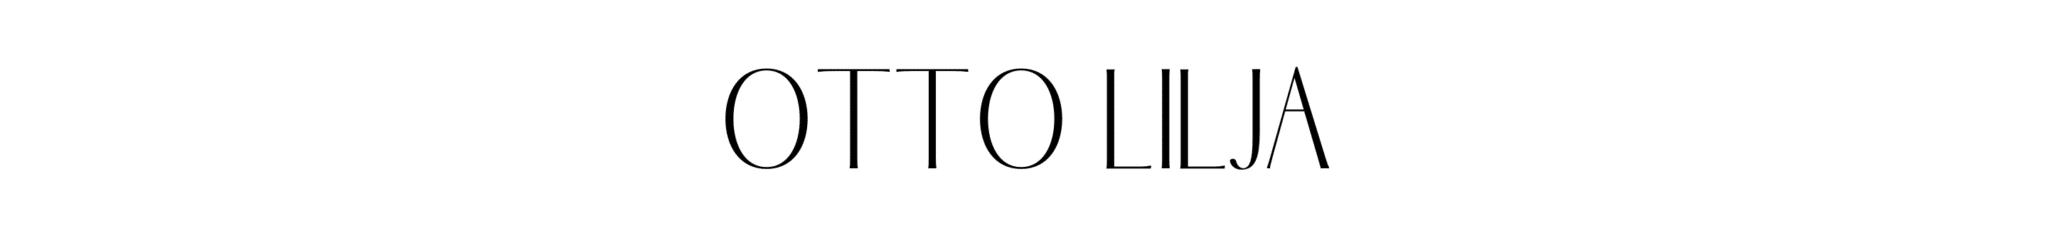 OTTO LILJA